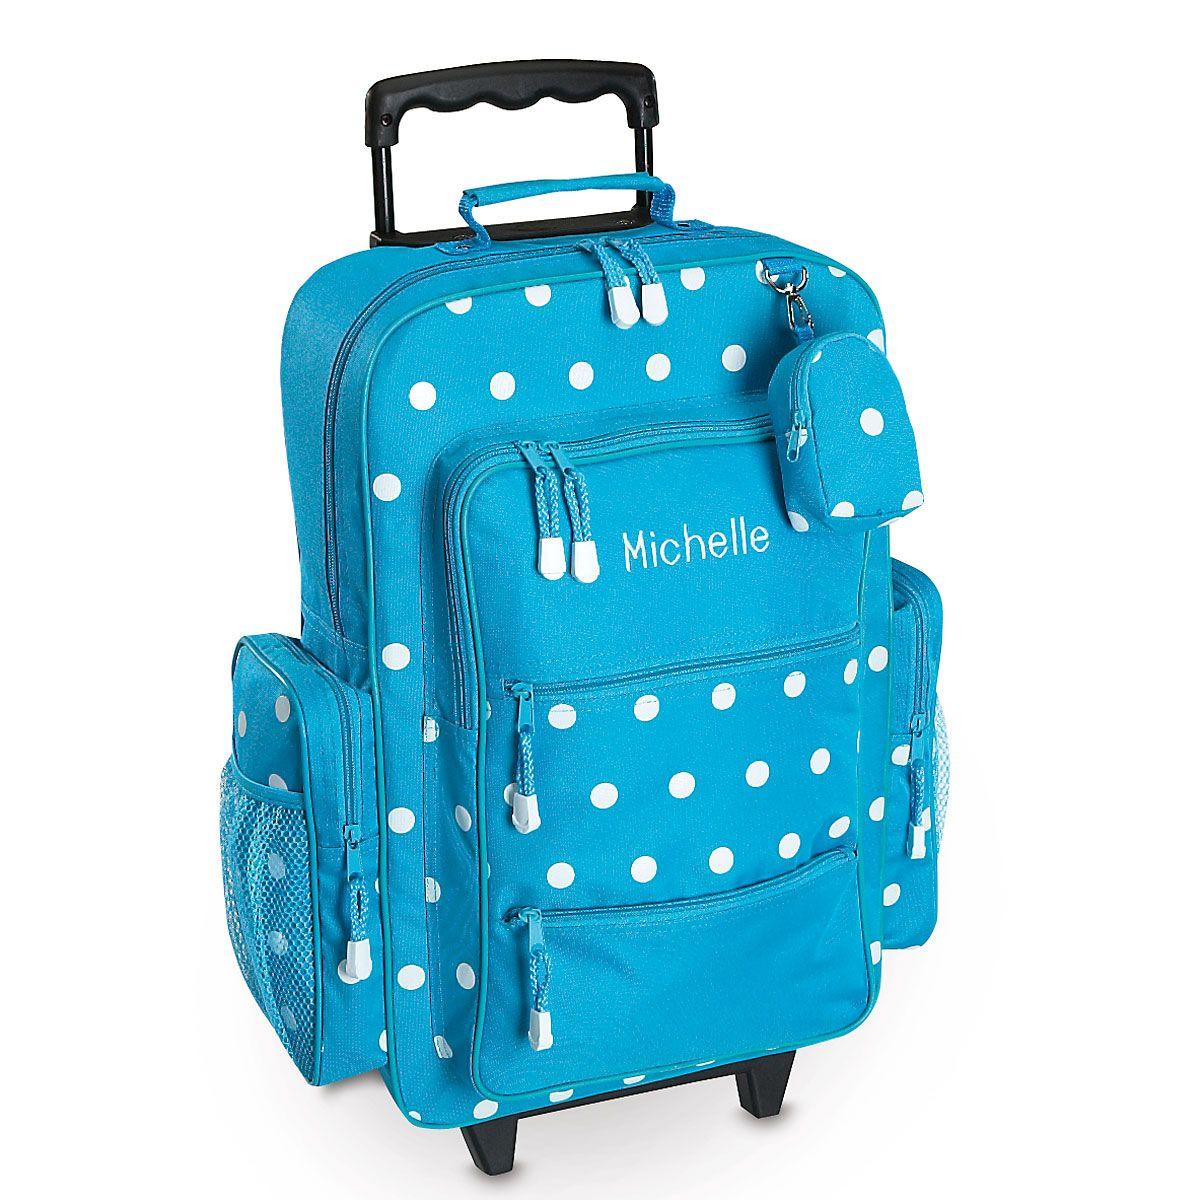 Turquoise Polka-Dot Rolling Luggage